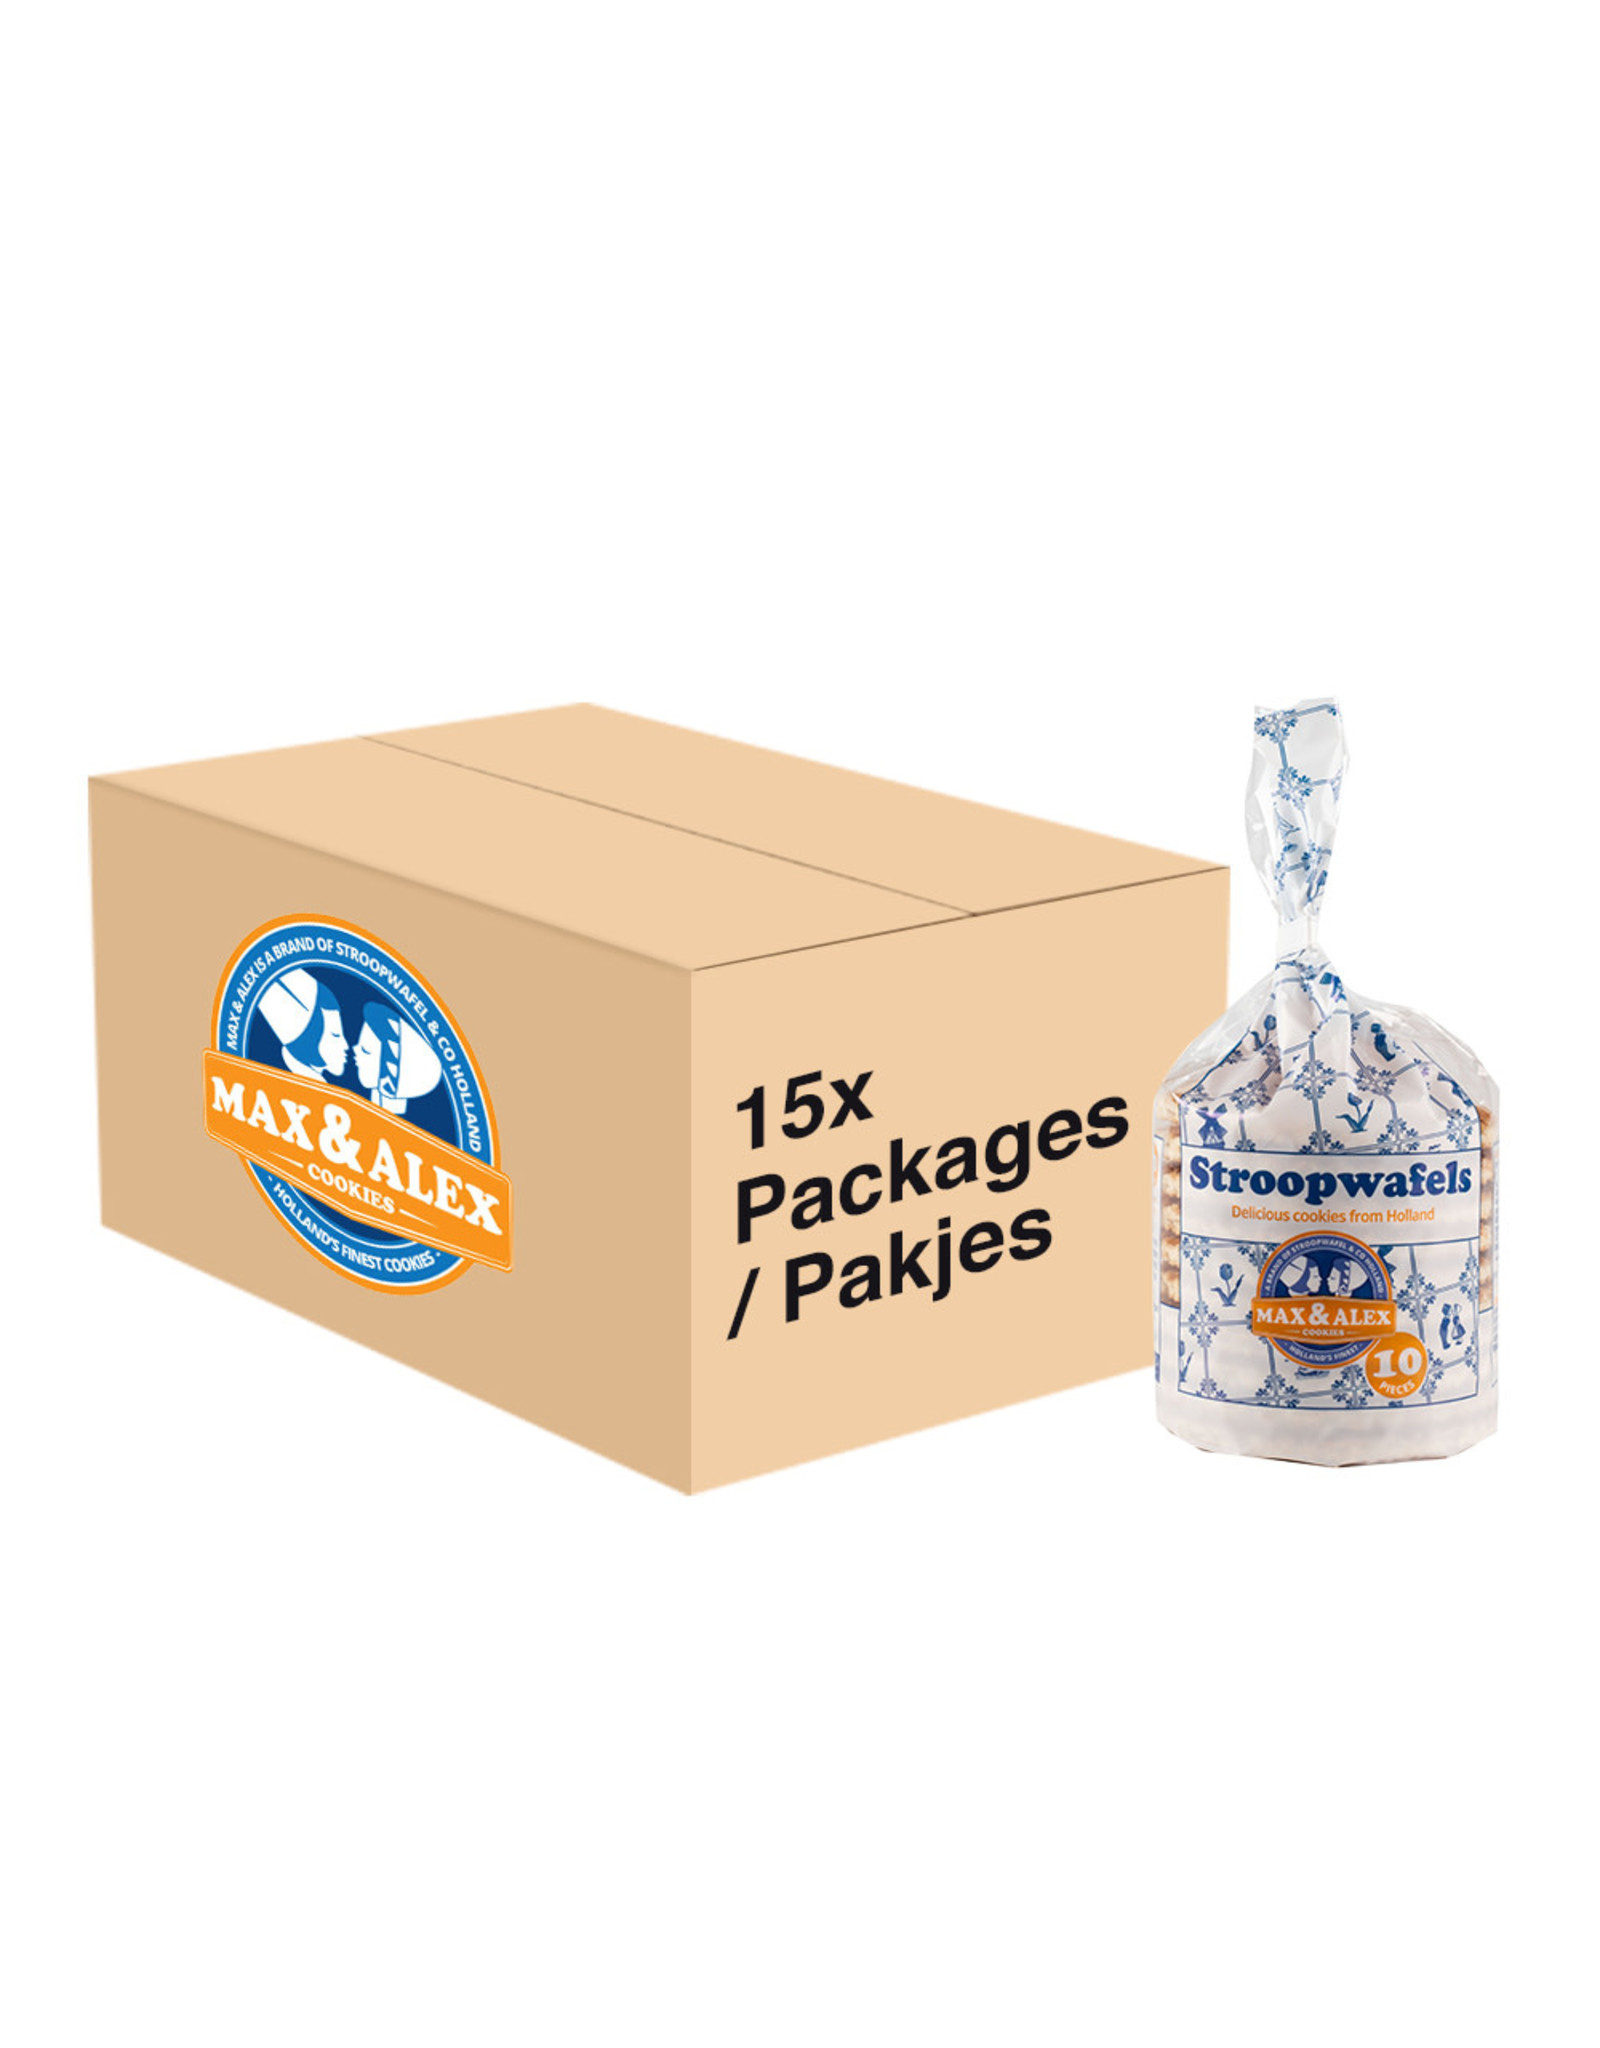 Max & Alex Max & Alex Sirop Gaufres 15x 250 gramme poche - carton principal